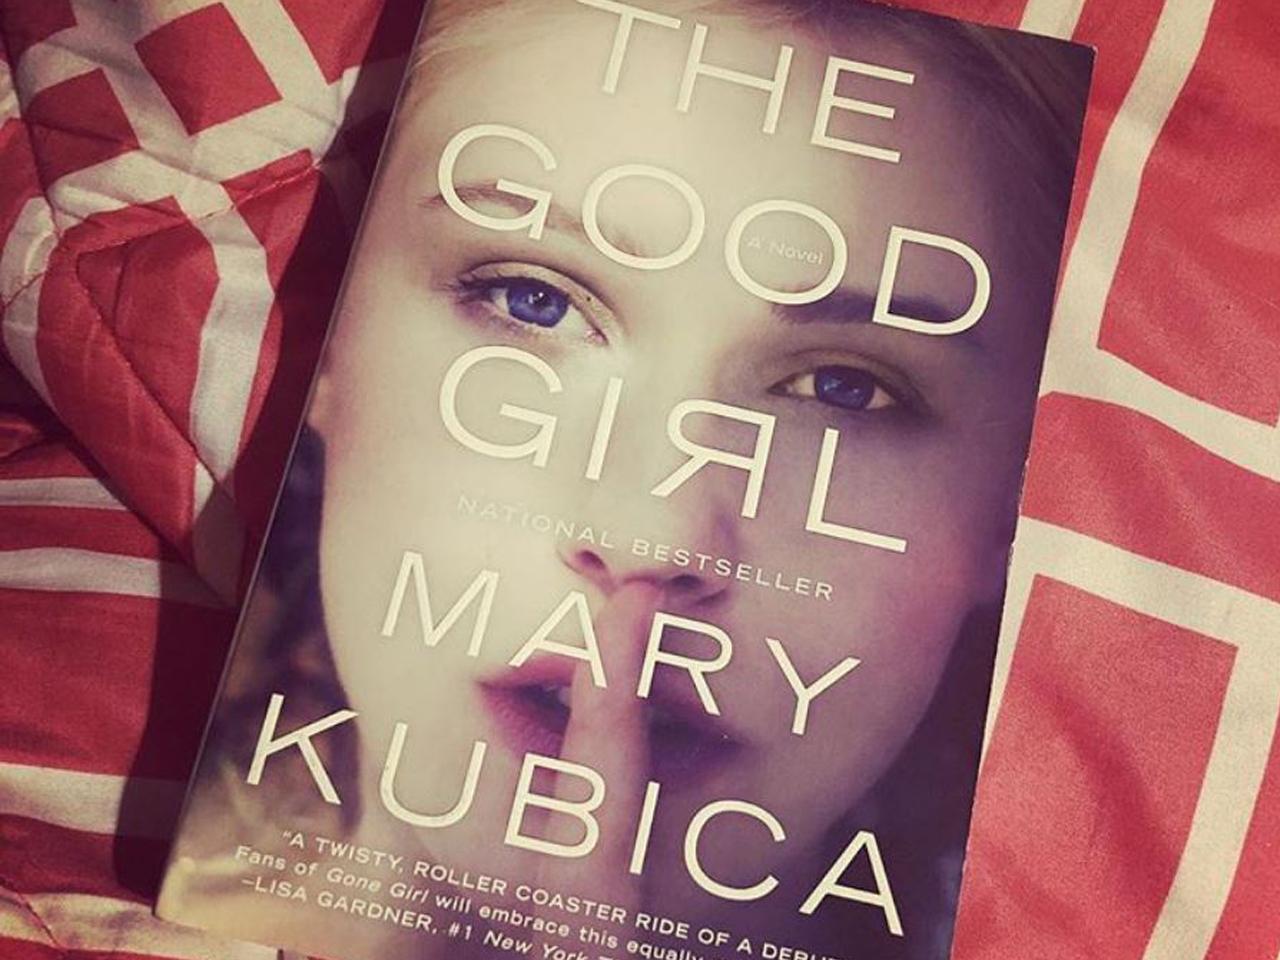 Review Buku Novel The Good Girl Oleh Mary Kubica